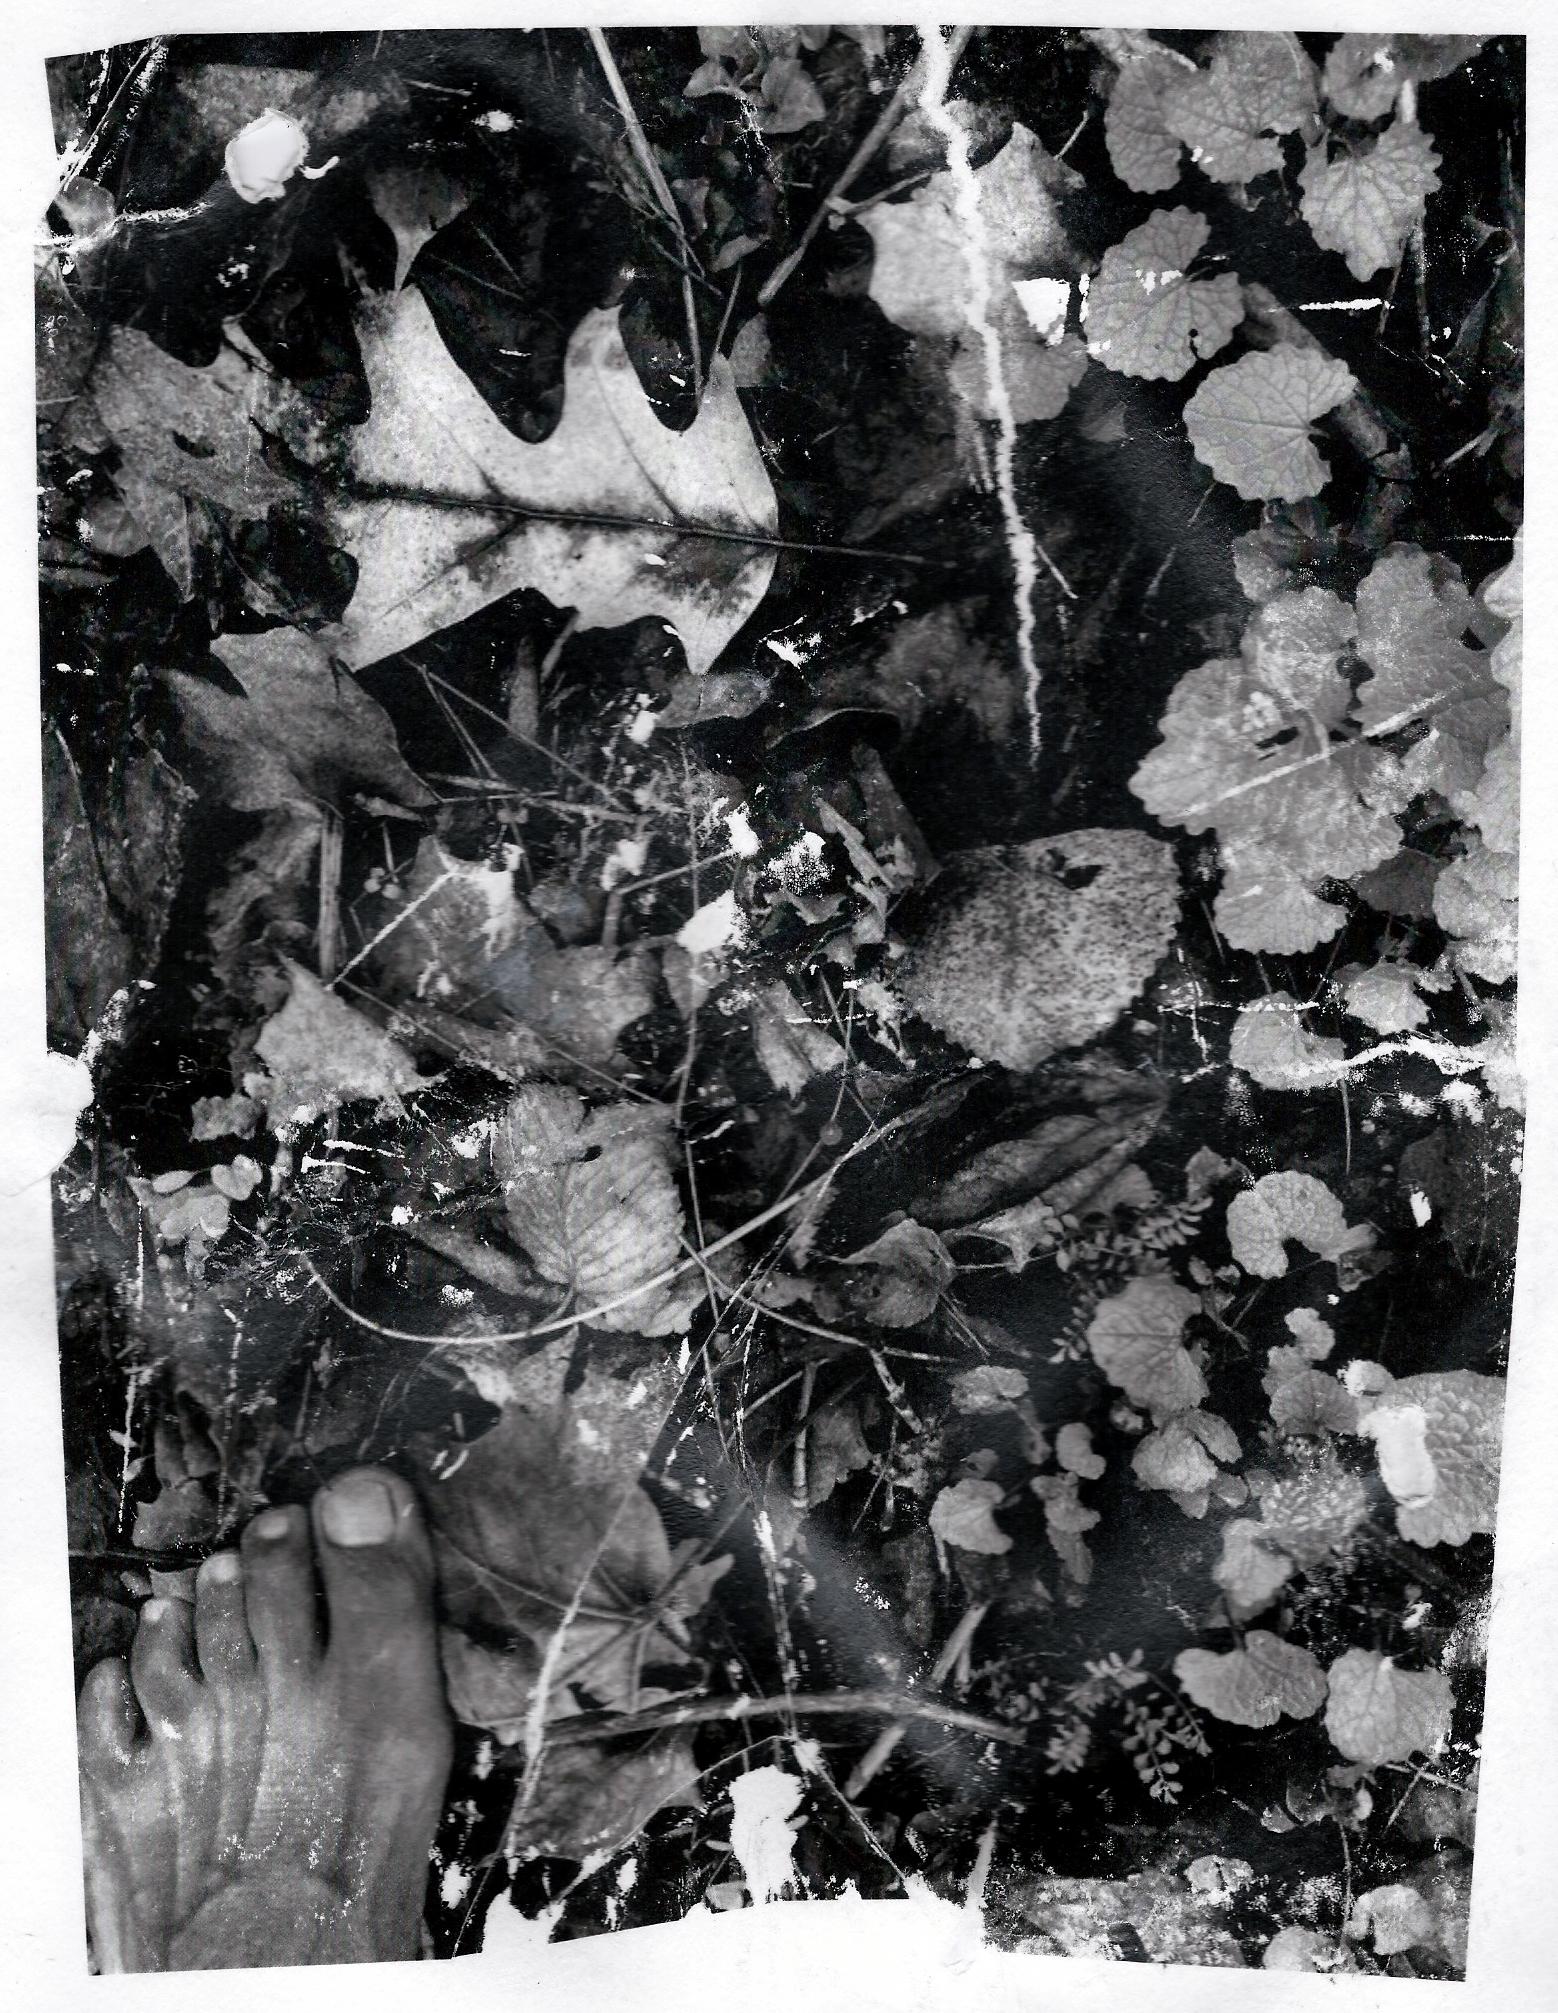 Walking The Don, 2021, photo-based gel transfer on archival paper, Sandra Brewster.